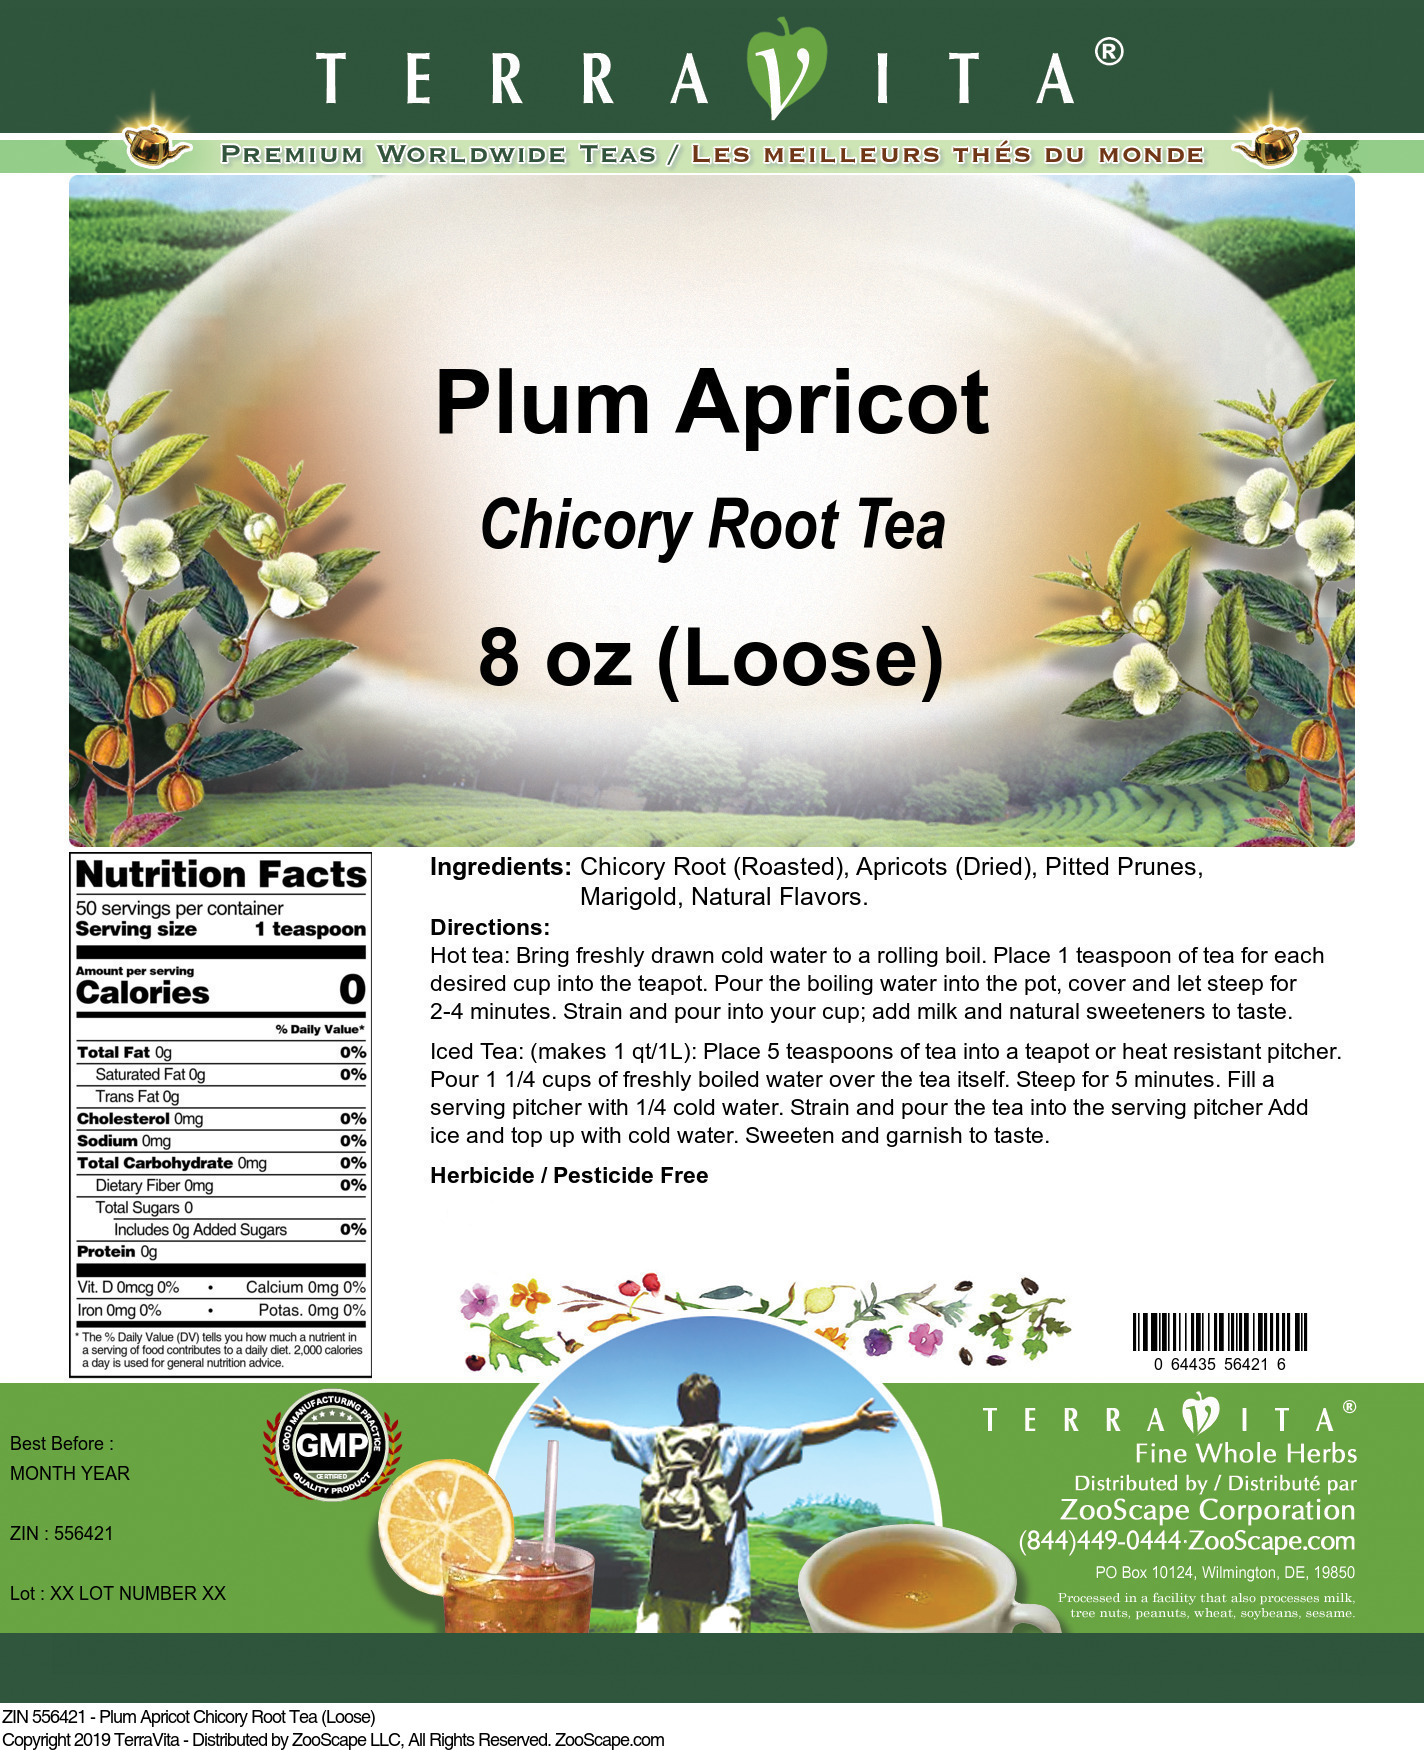 Plum Apricot Chicory Root Tea (Loose)